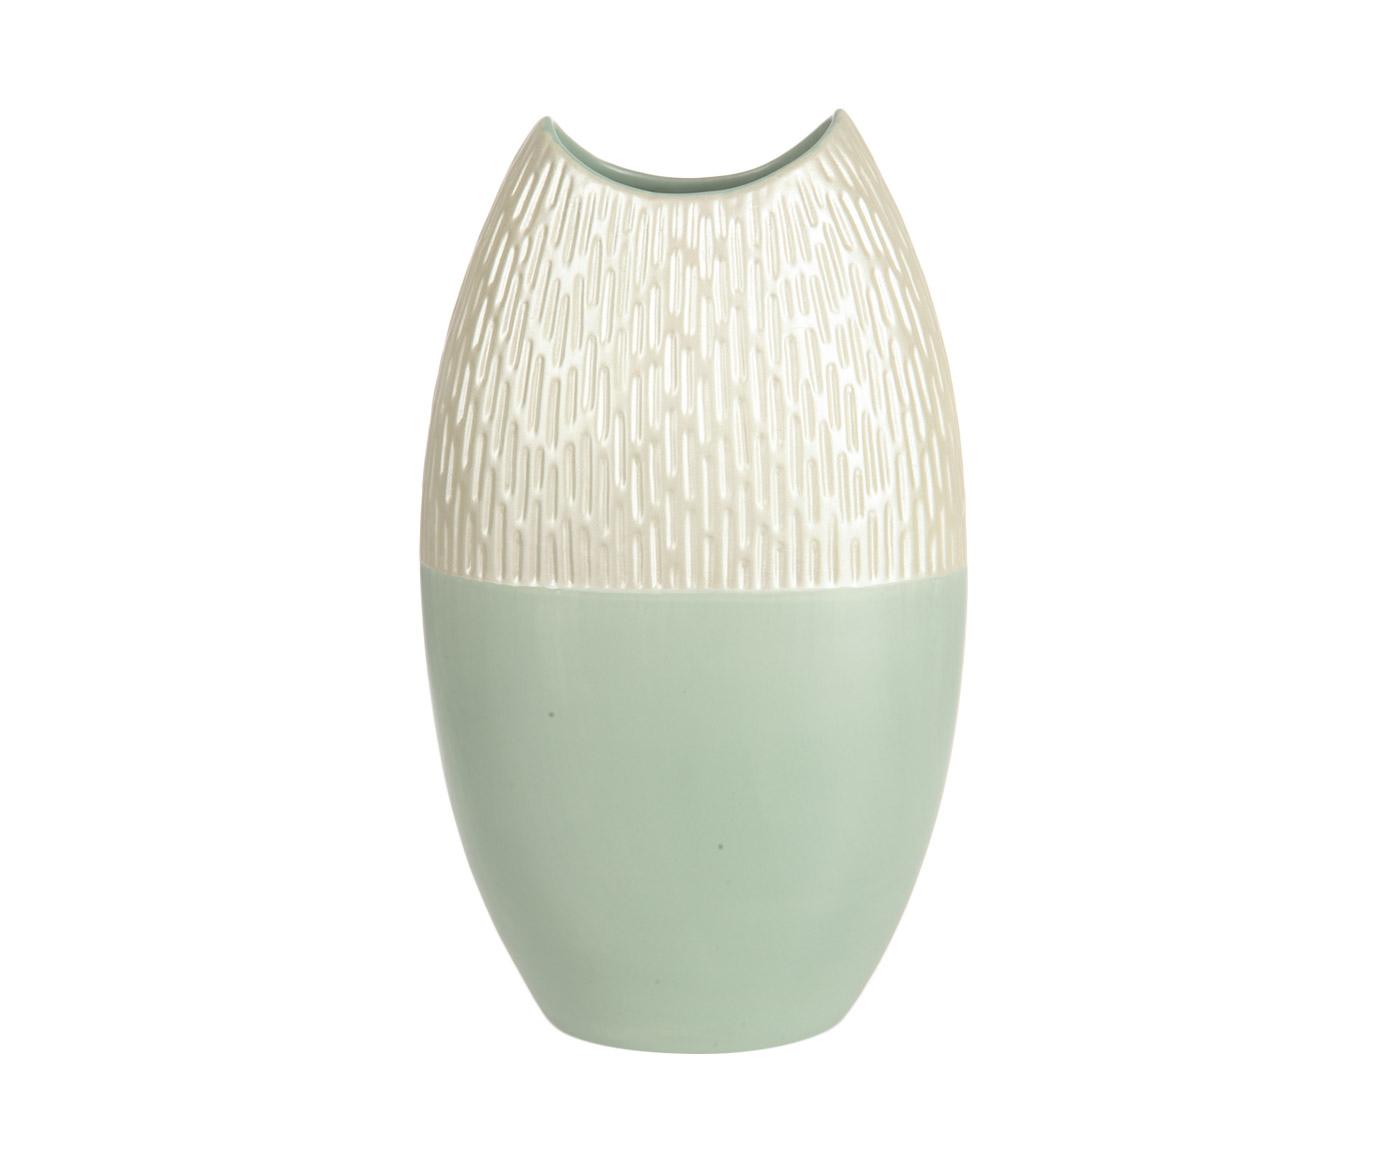 Декоративная ваза Farol 15430070 от thefurnish